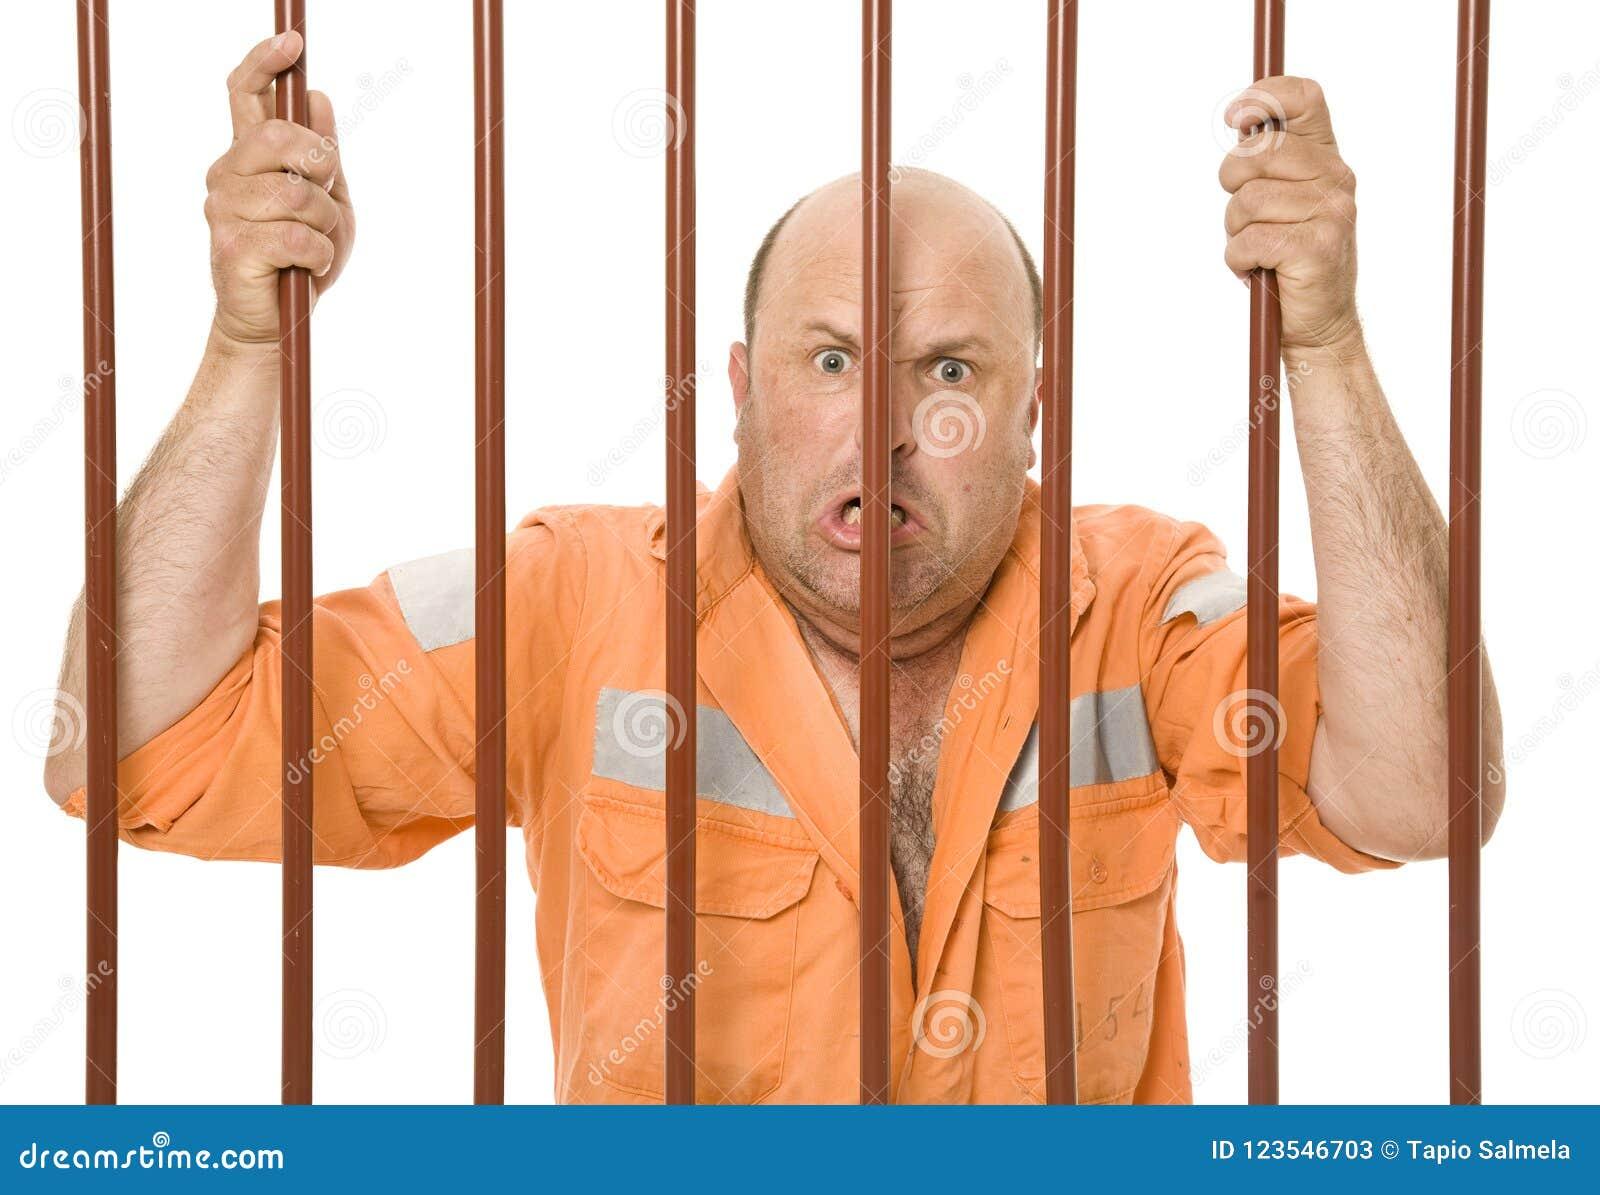 Will Locked up behind bars necessary words